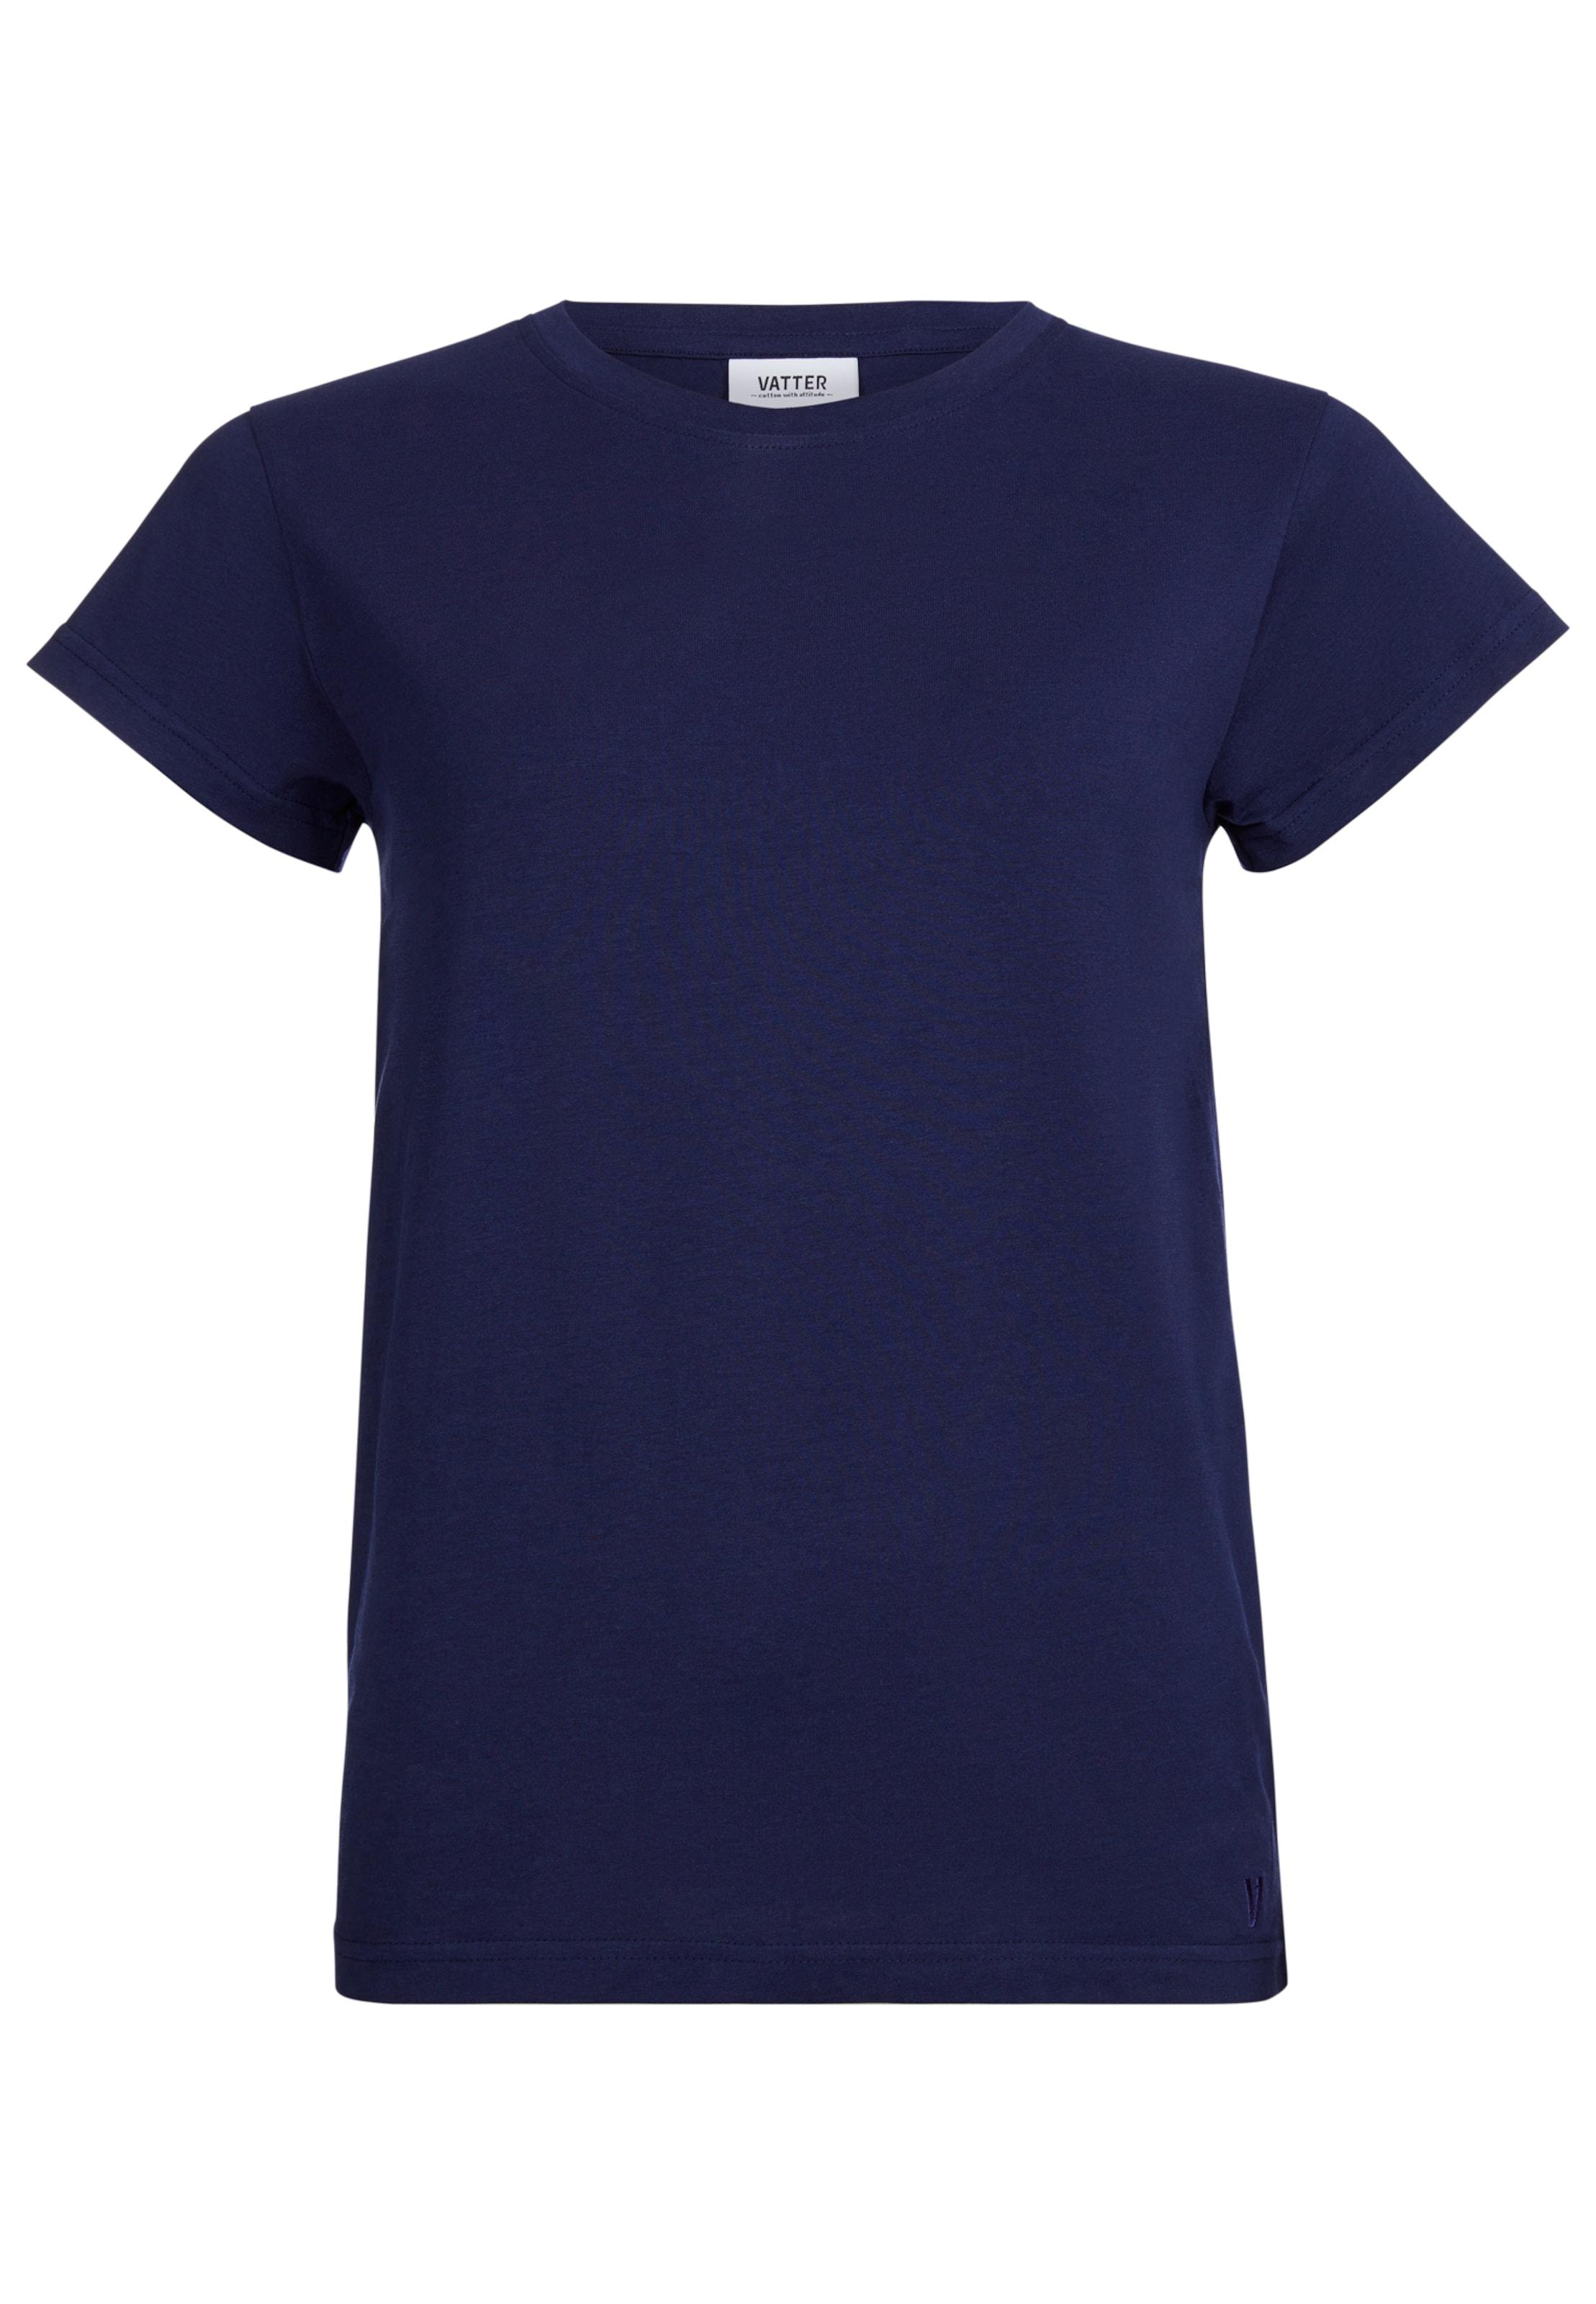 In Blau 'daily Daisy' Vatter T shirt CtsrdxQhB